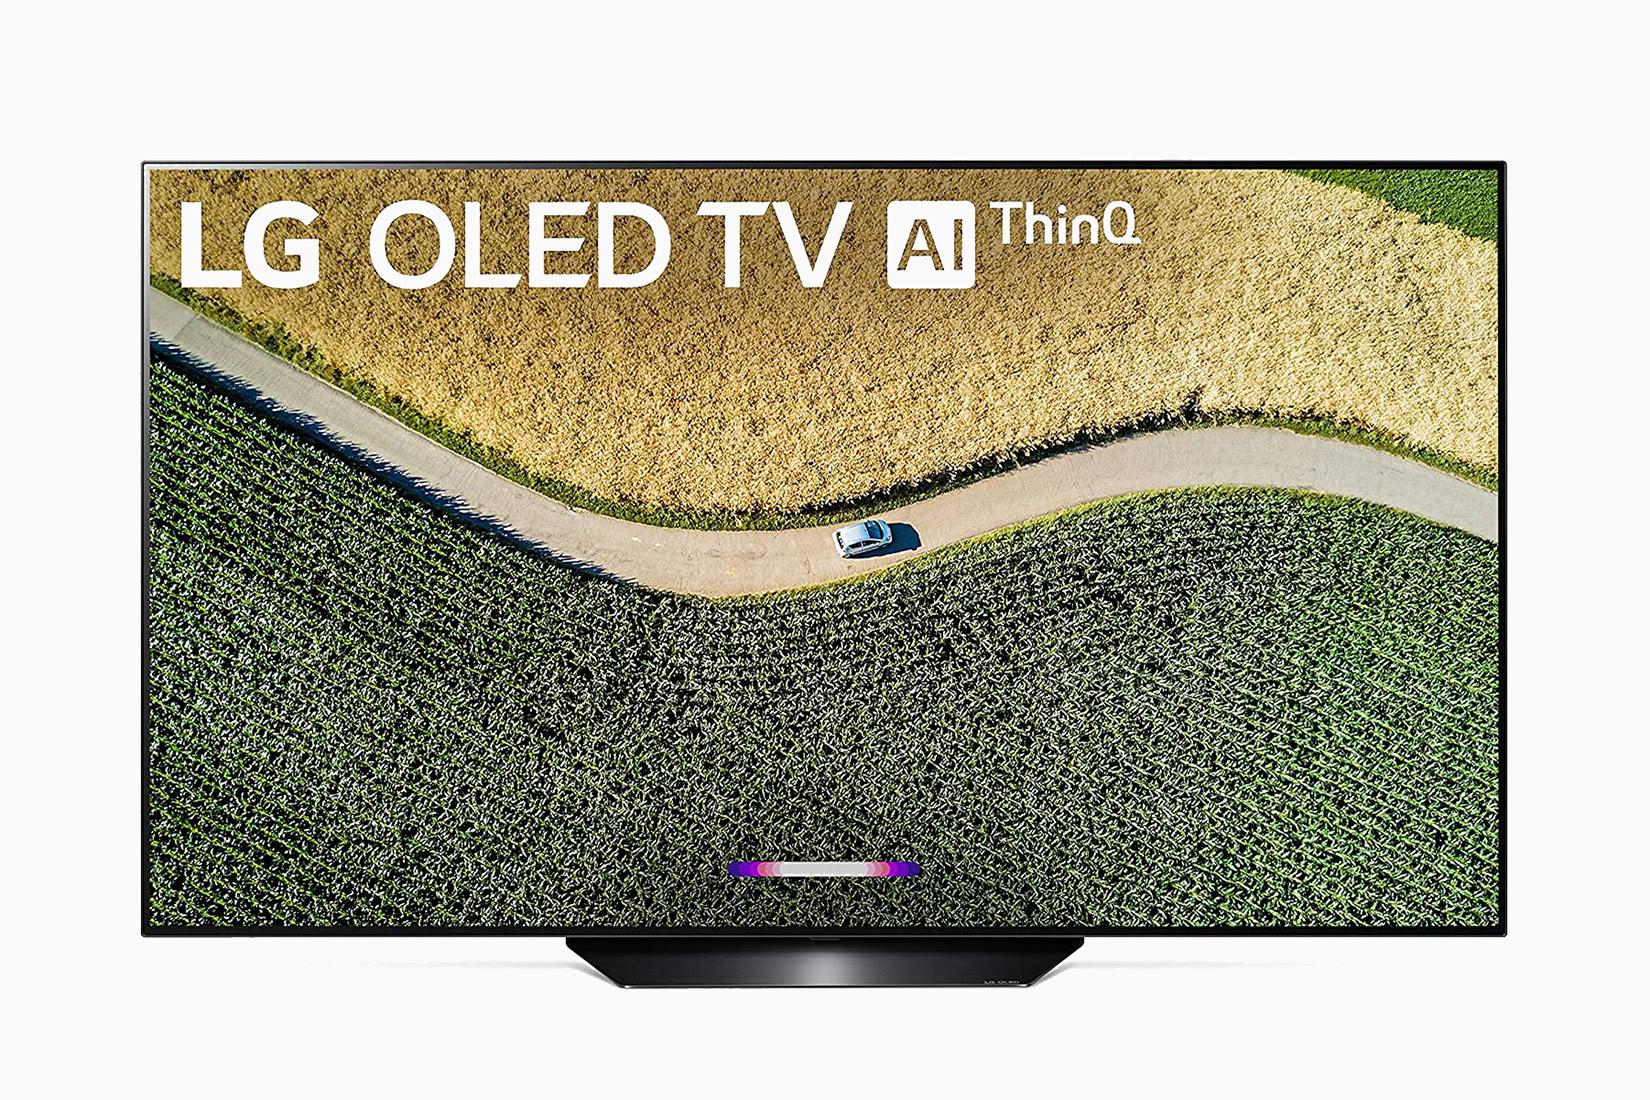 best high-end tvs LG OLED55B9PUA B9 Series - Luxe Digital